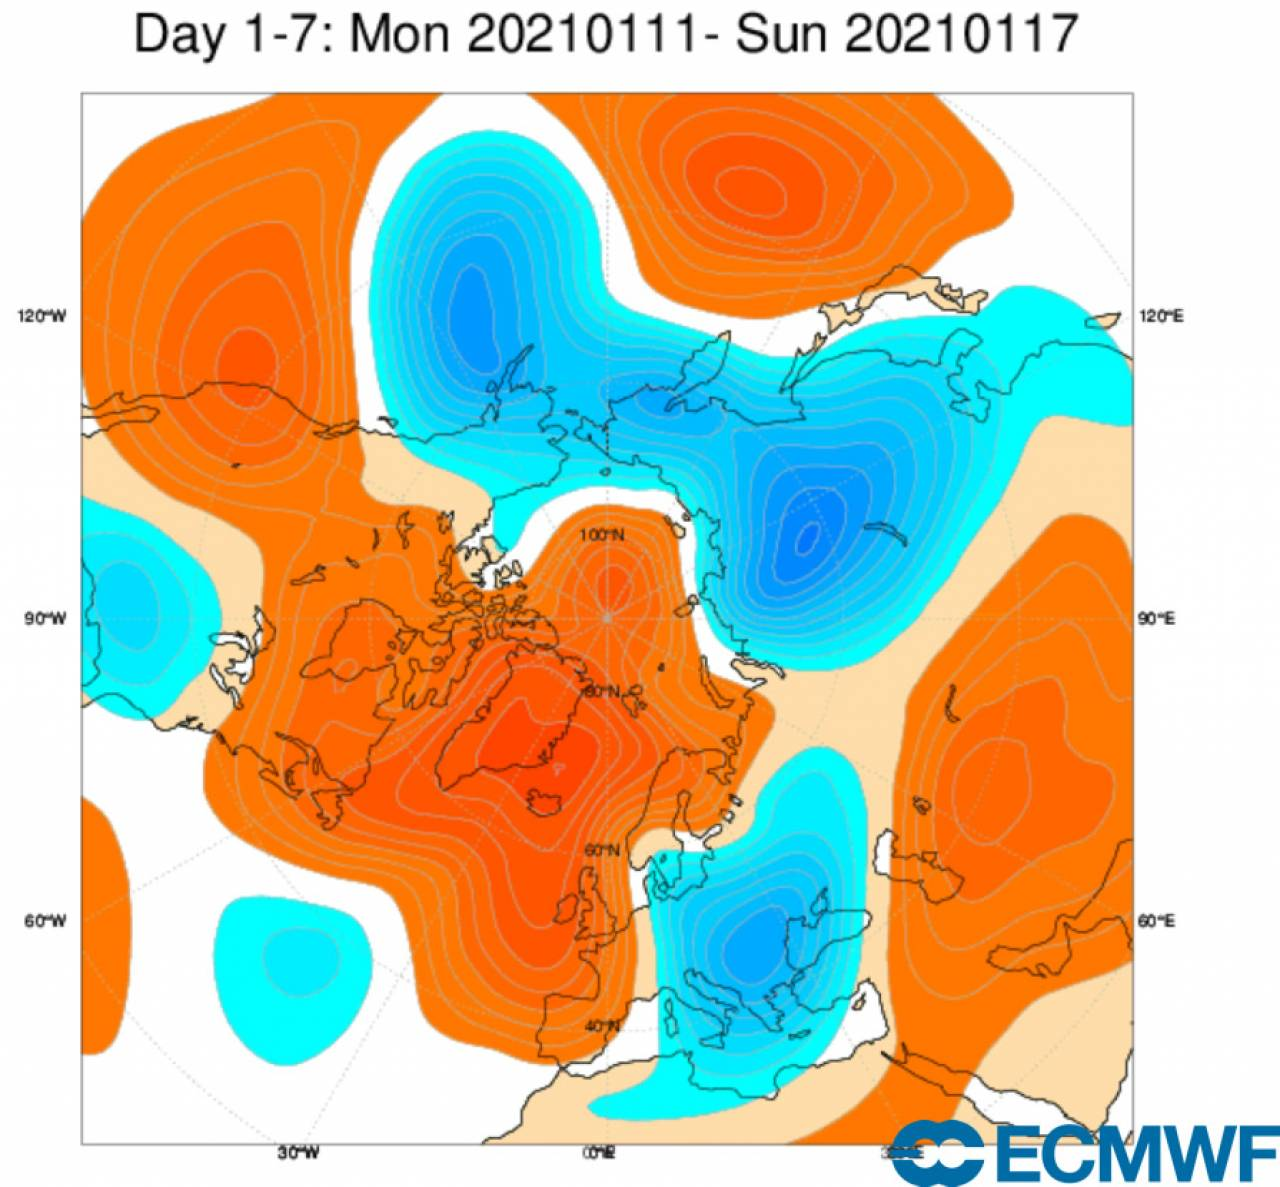 anomalie geopotenziale 500 hPa fonte ecmwf